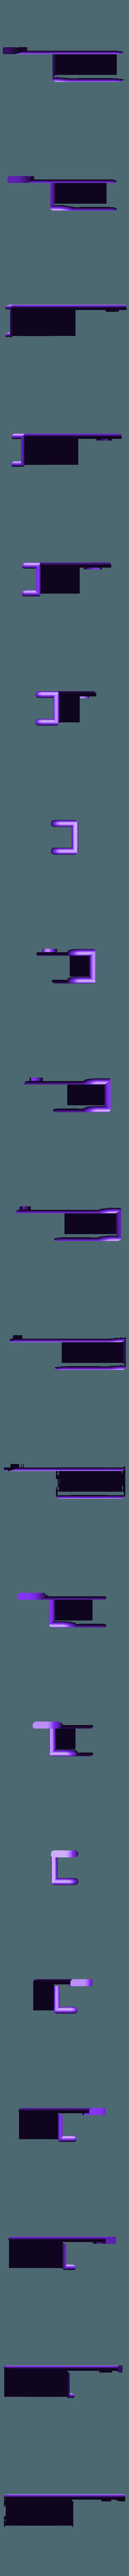 ArmRight.stl Download free STL file iPad Tripod Support for TikTok Kids • 3D printable template, michelj